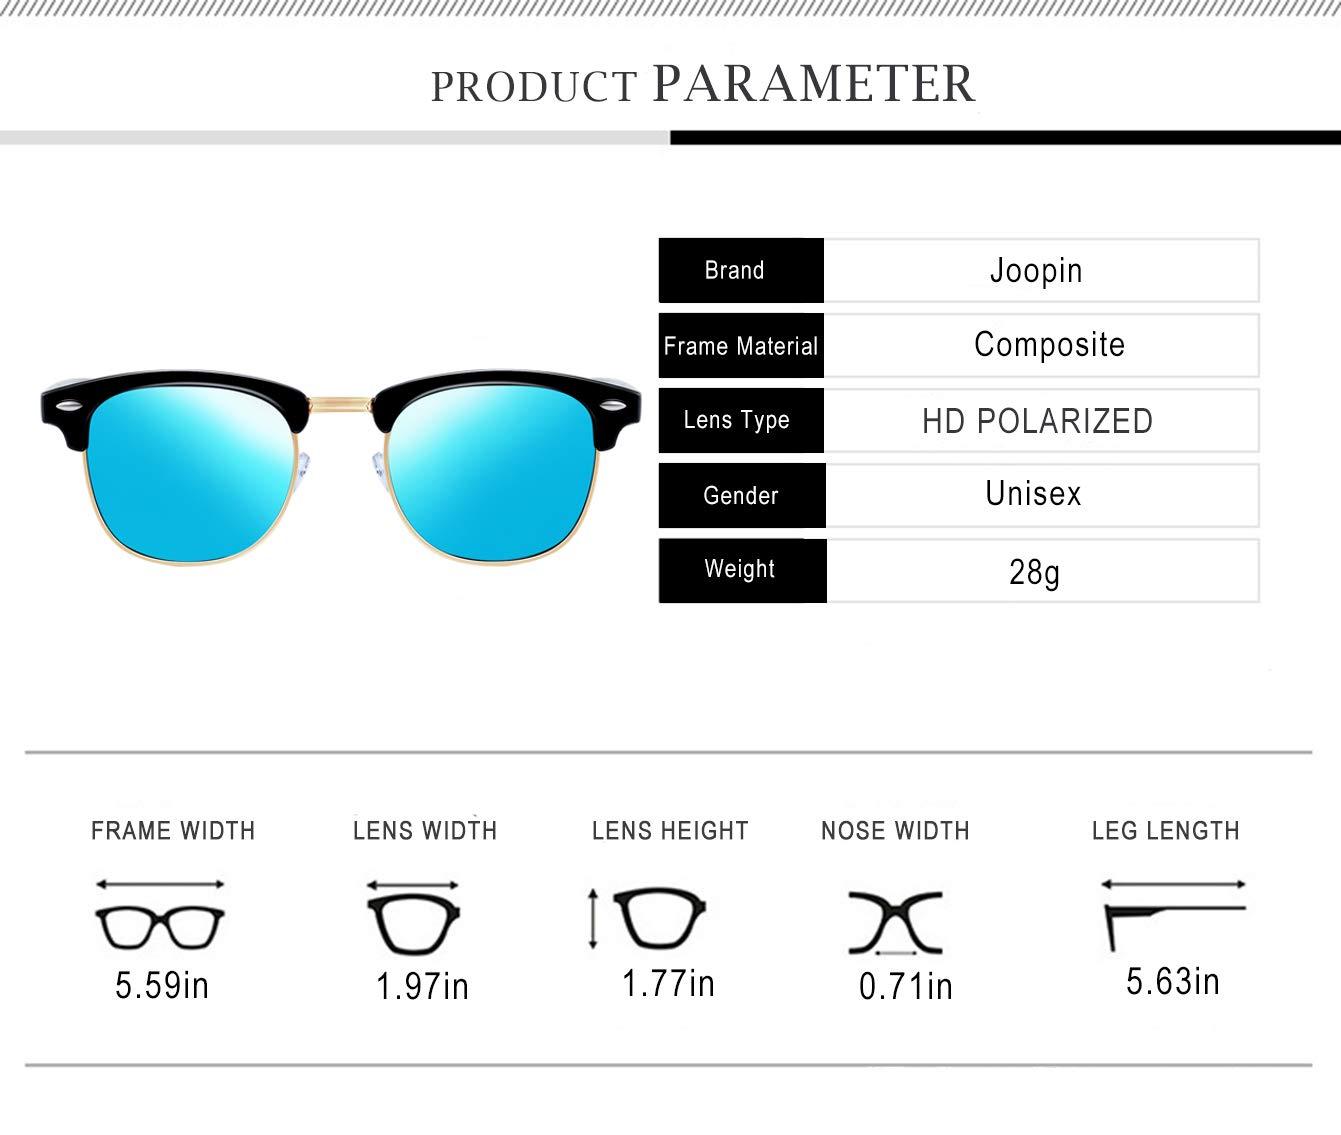 1a18b0df1259 Joopin Semi-Rimless Polarized Sunglasses Women Men Brand Vintage Sun Glasses  H9041-09